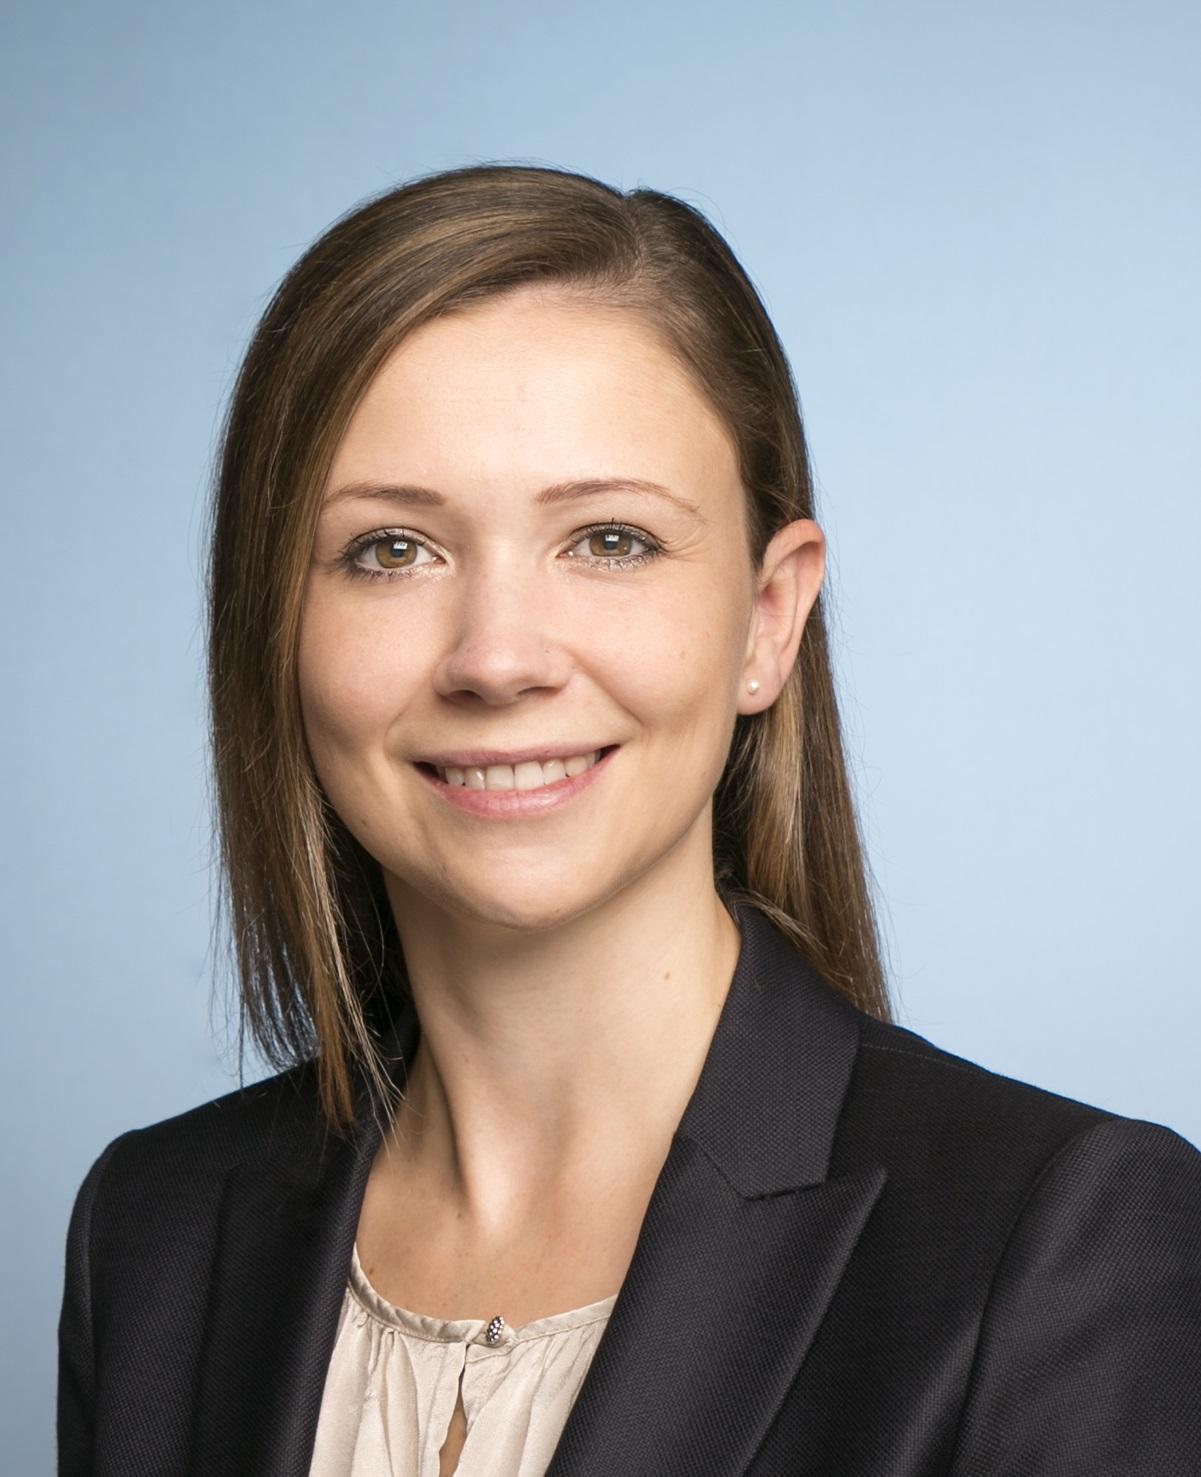 Alexandra Weck